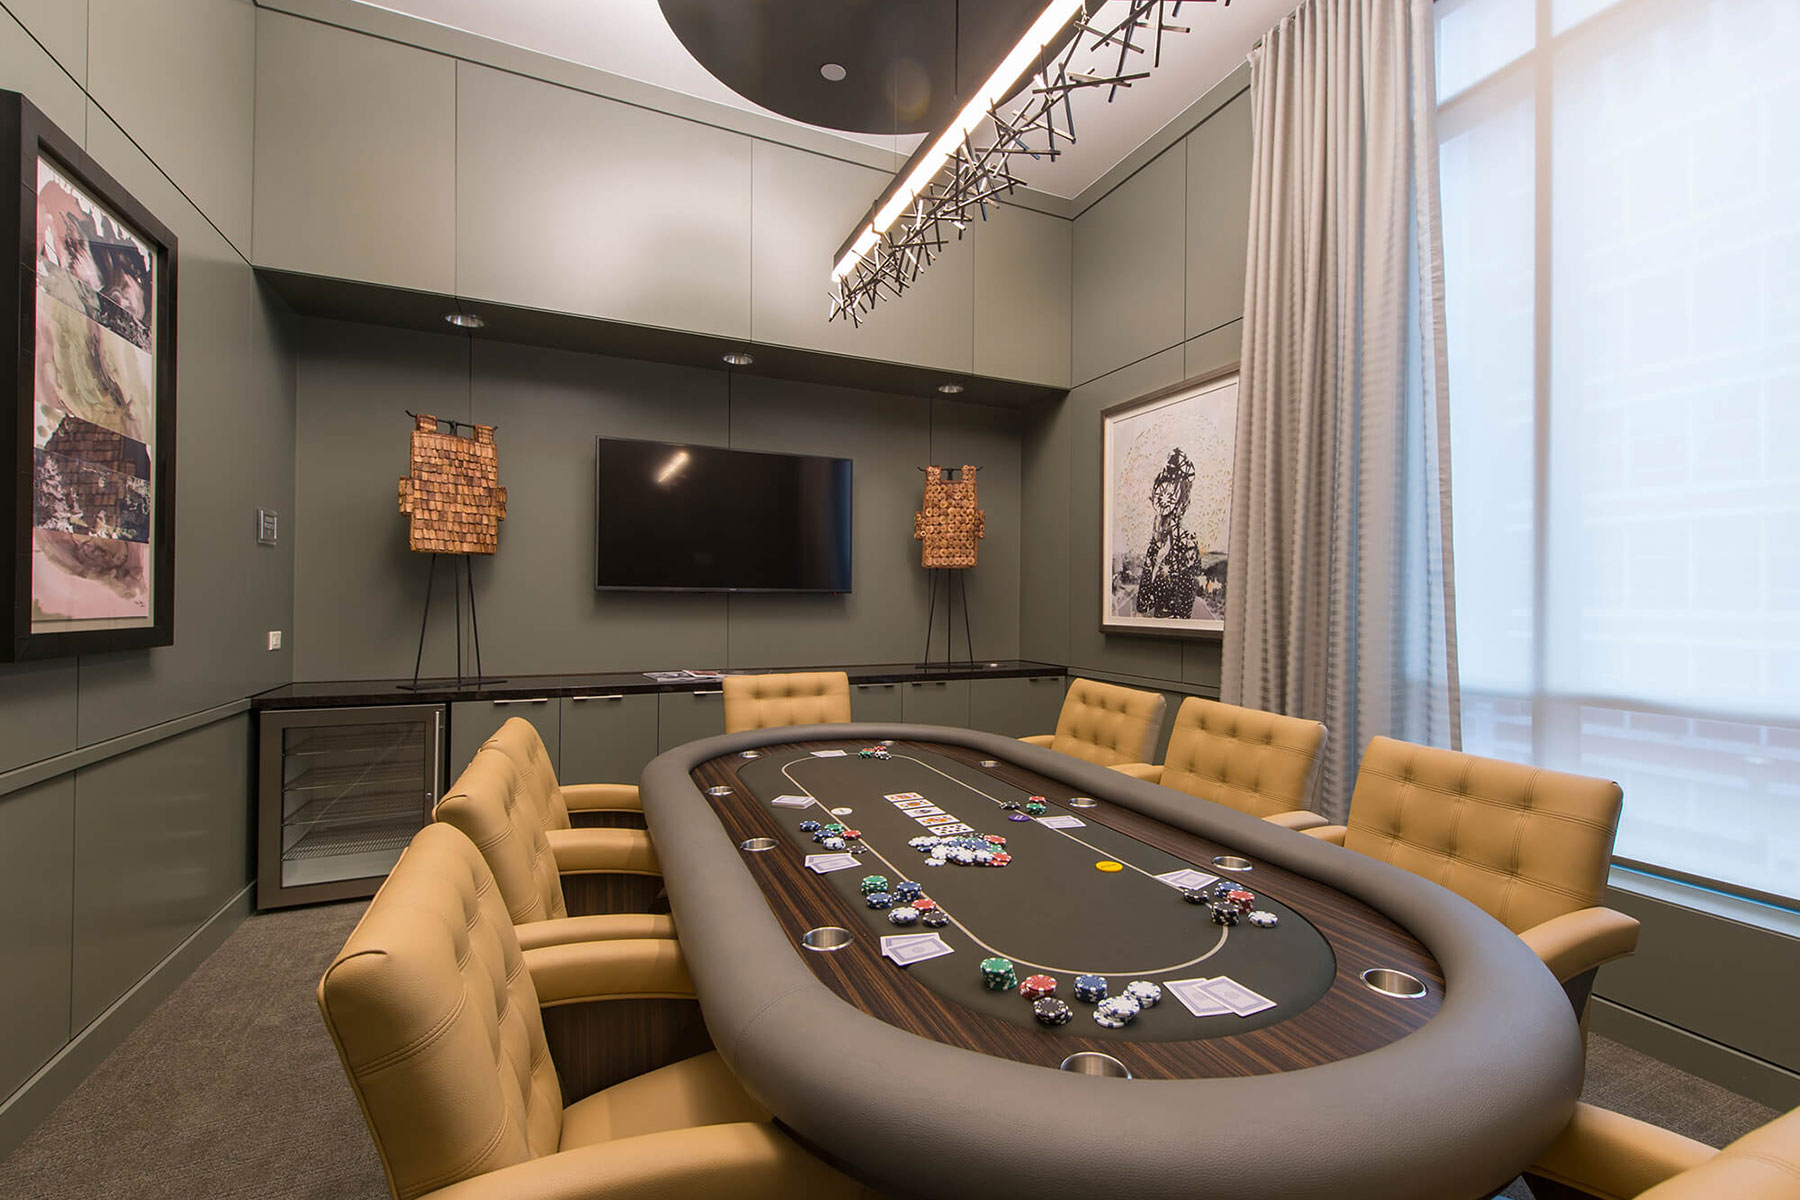 Market Square Tower Poker